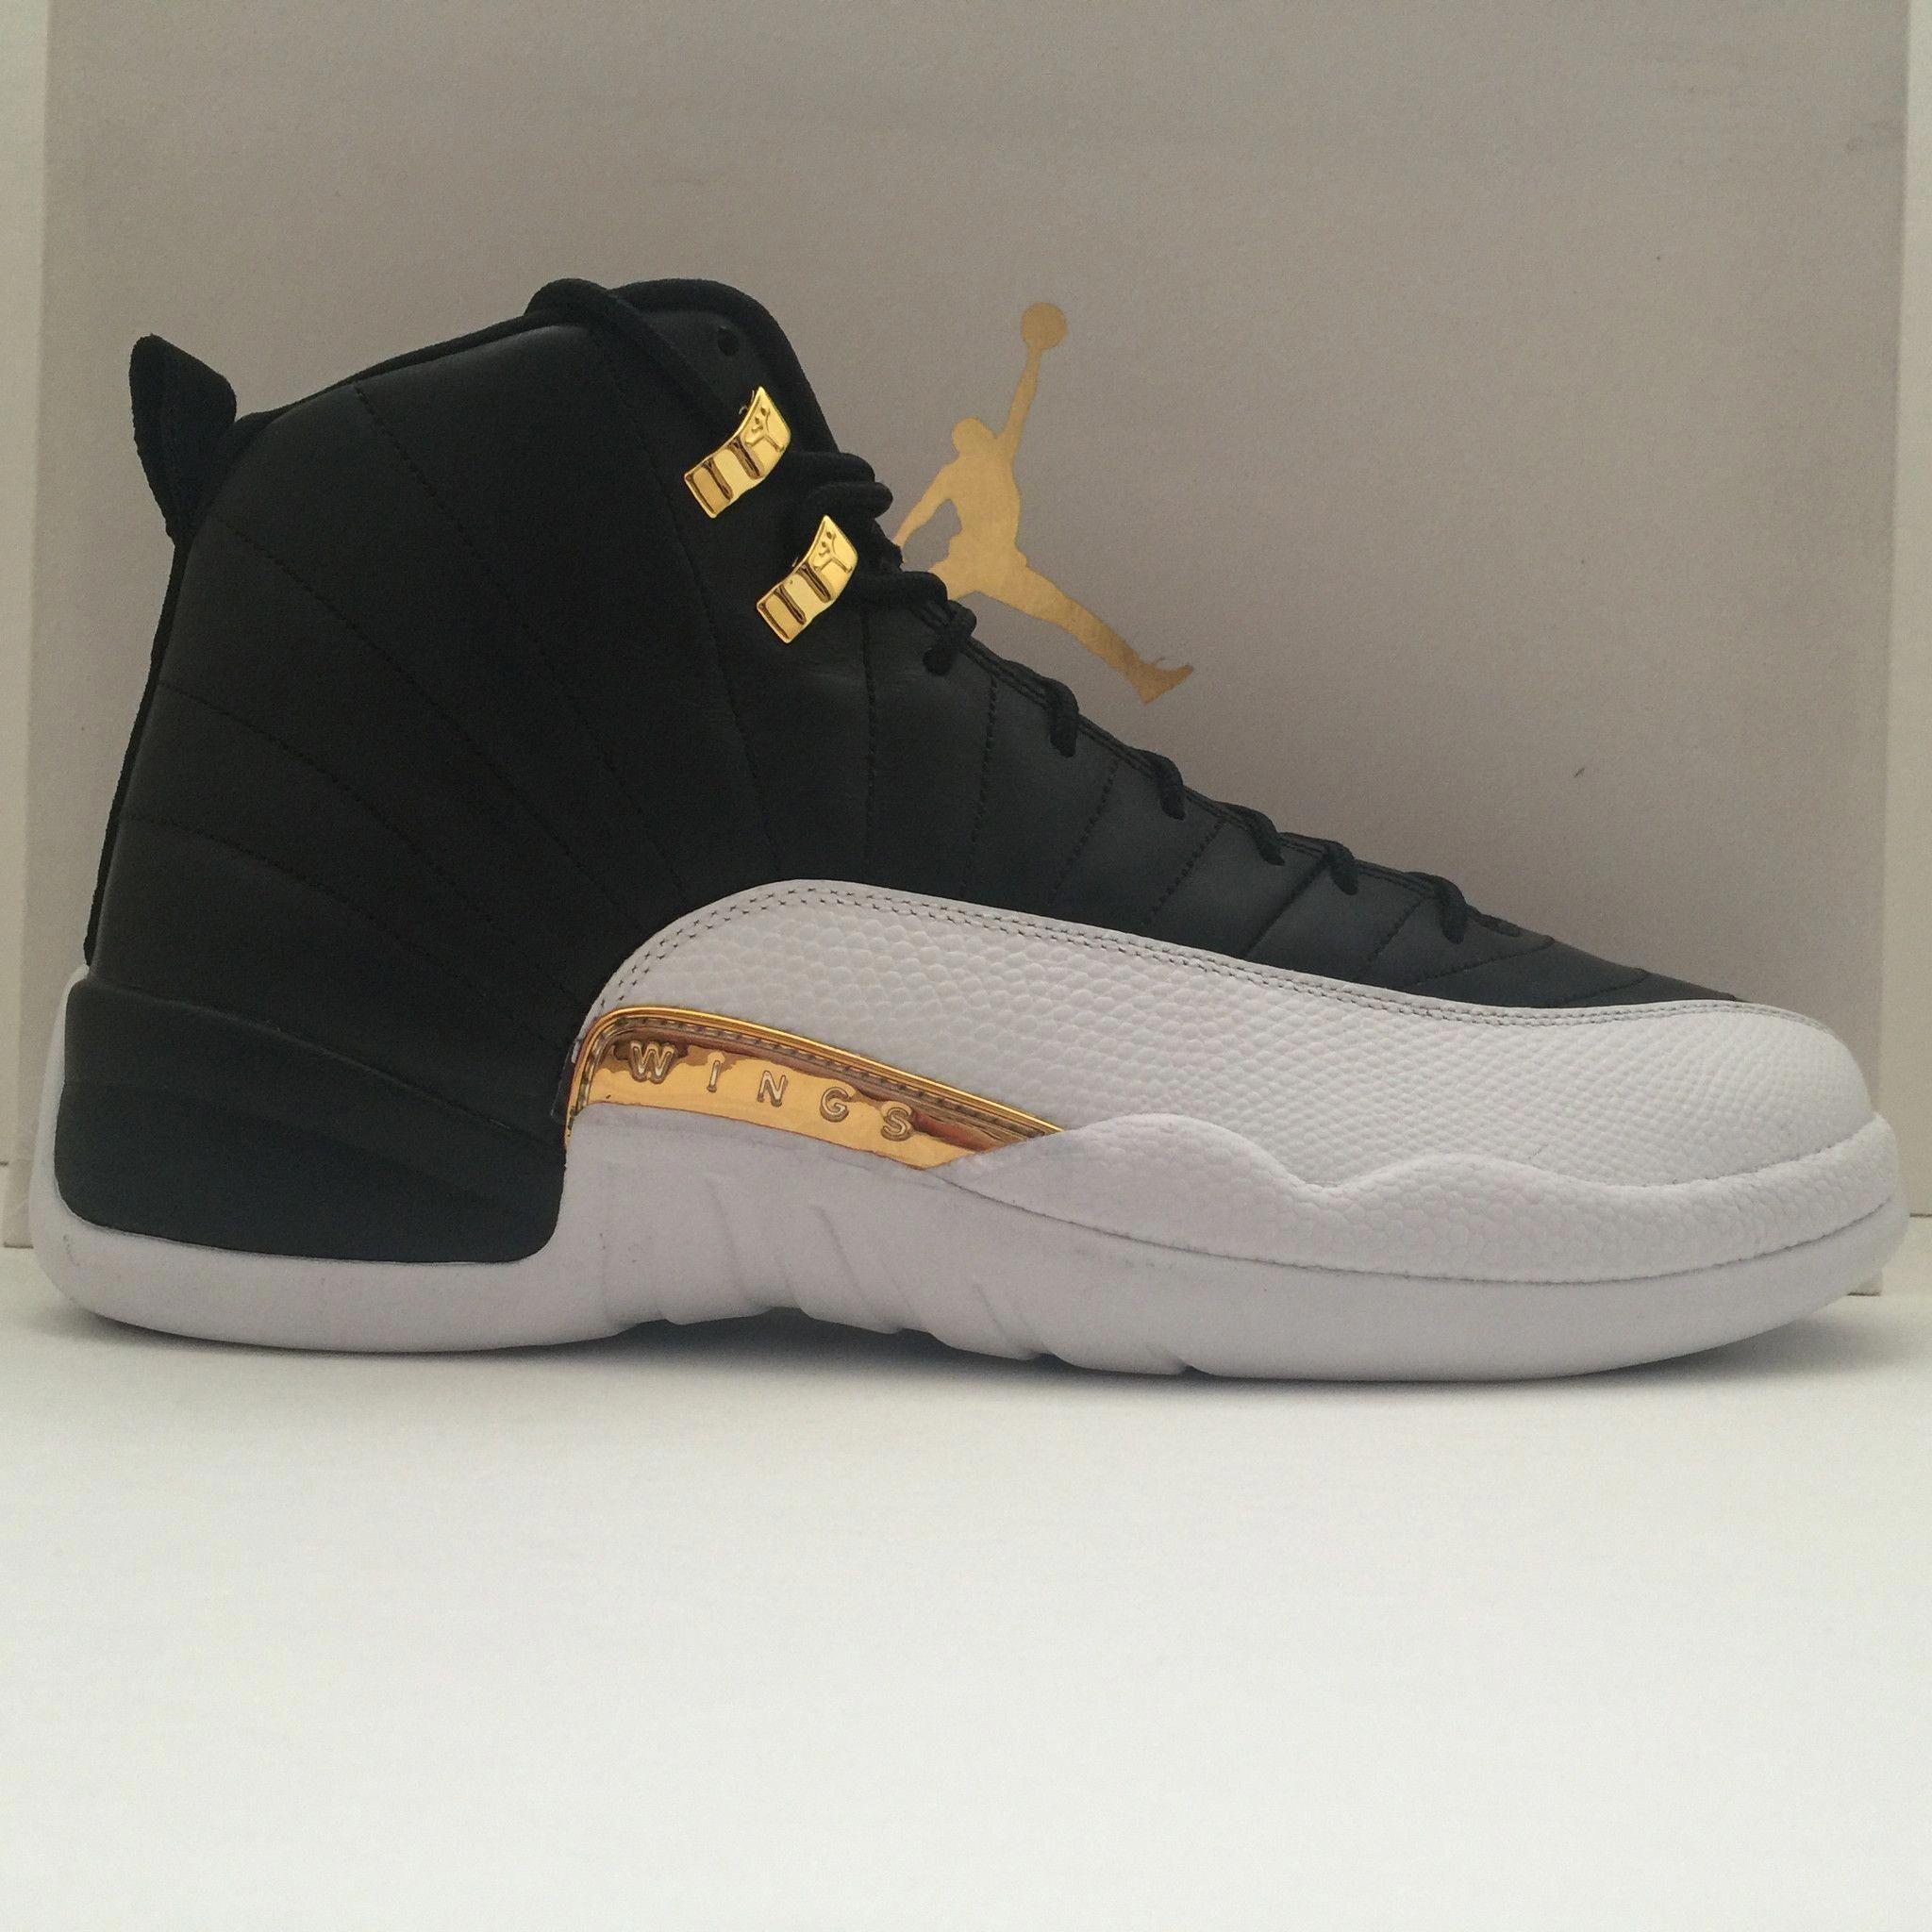 the best attitude 99ebb 8c284 DS Nike Air Jordan 12 XII Retro Wings Size 11  basketballtrainingequipment